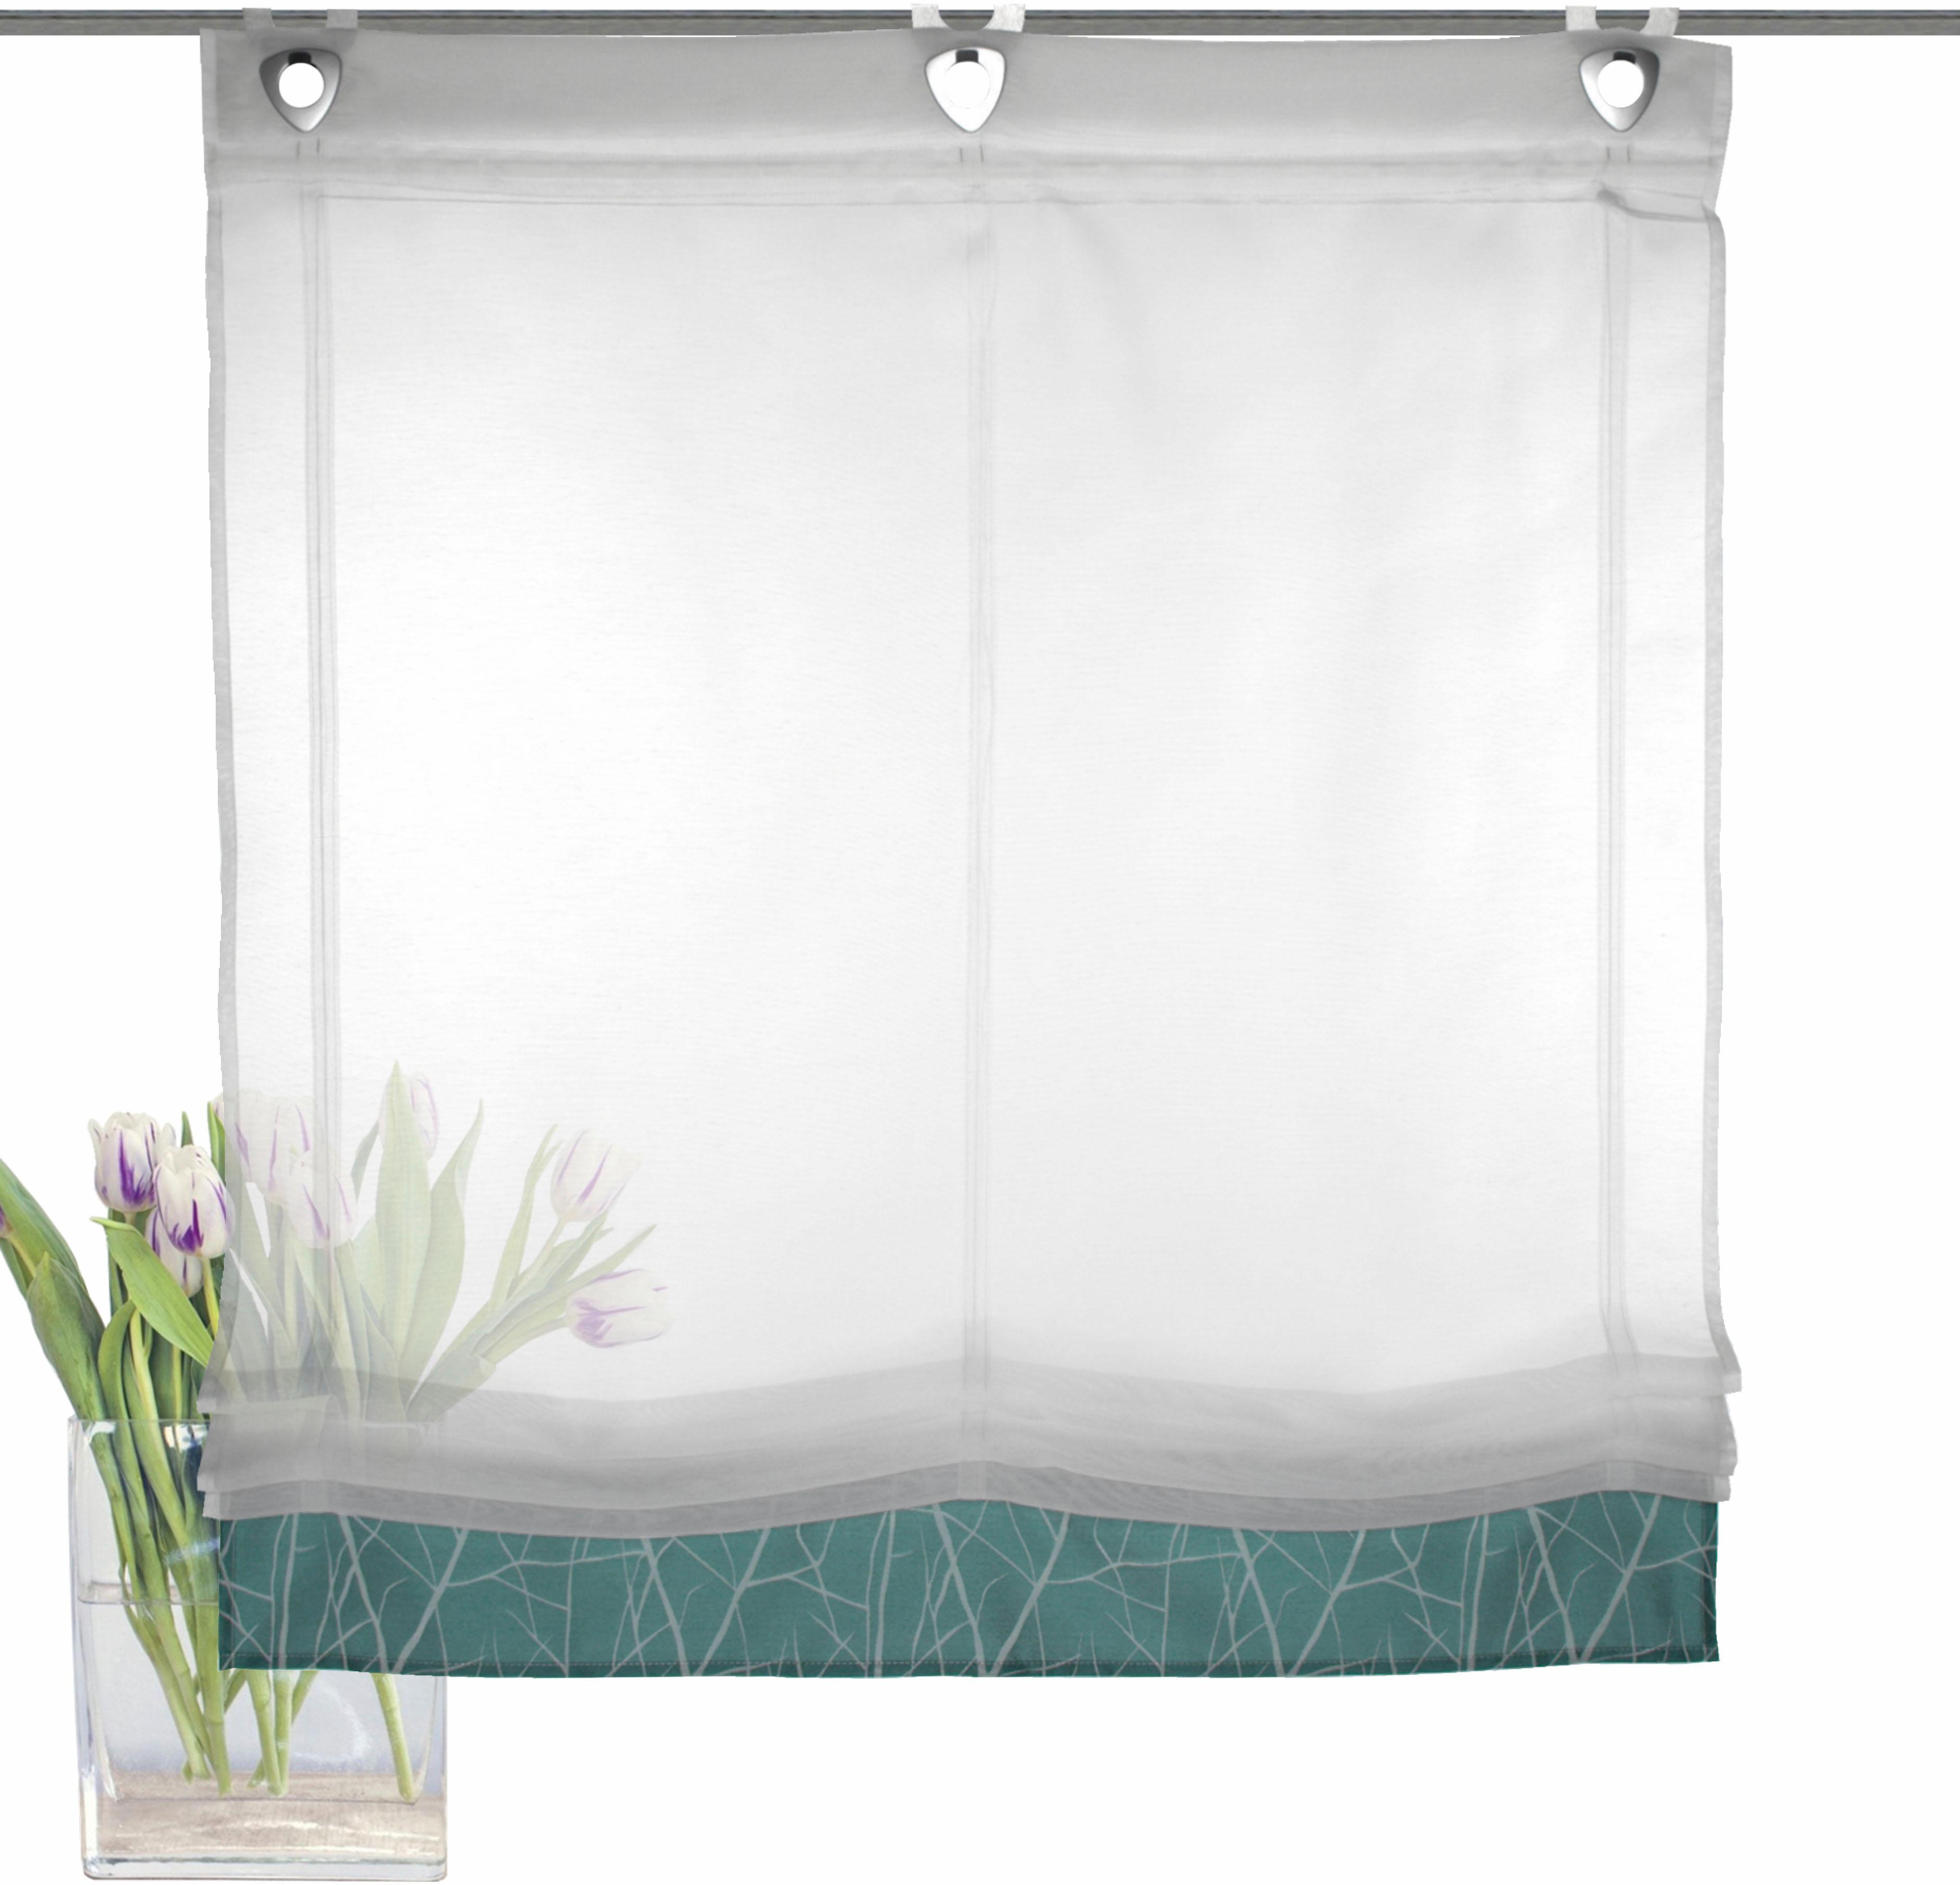 raffrollo campos mit hakenaufh ngung ohne bohren haken. Black Bedroom Furniture Sets. Home Design Ideas